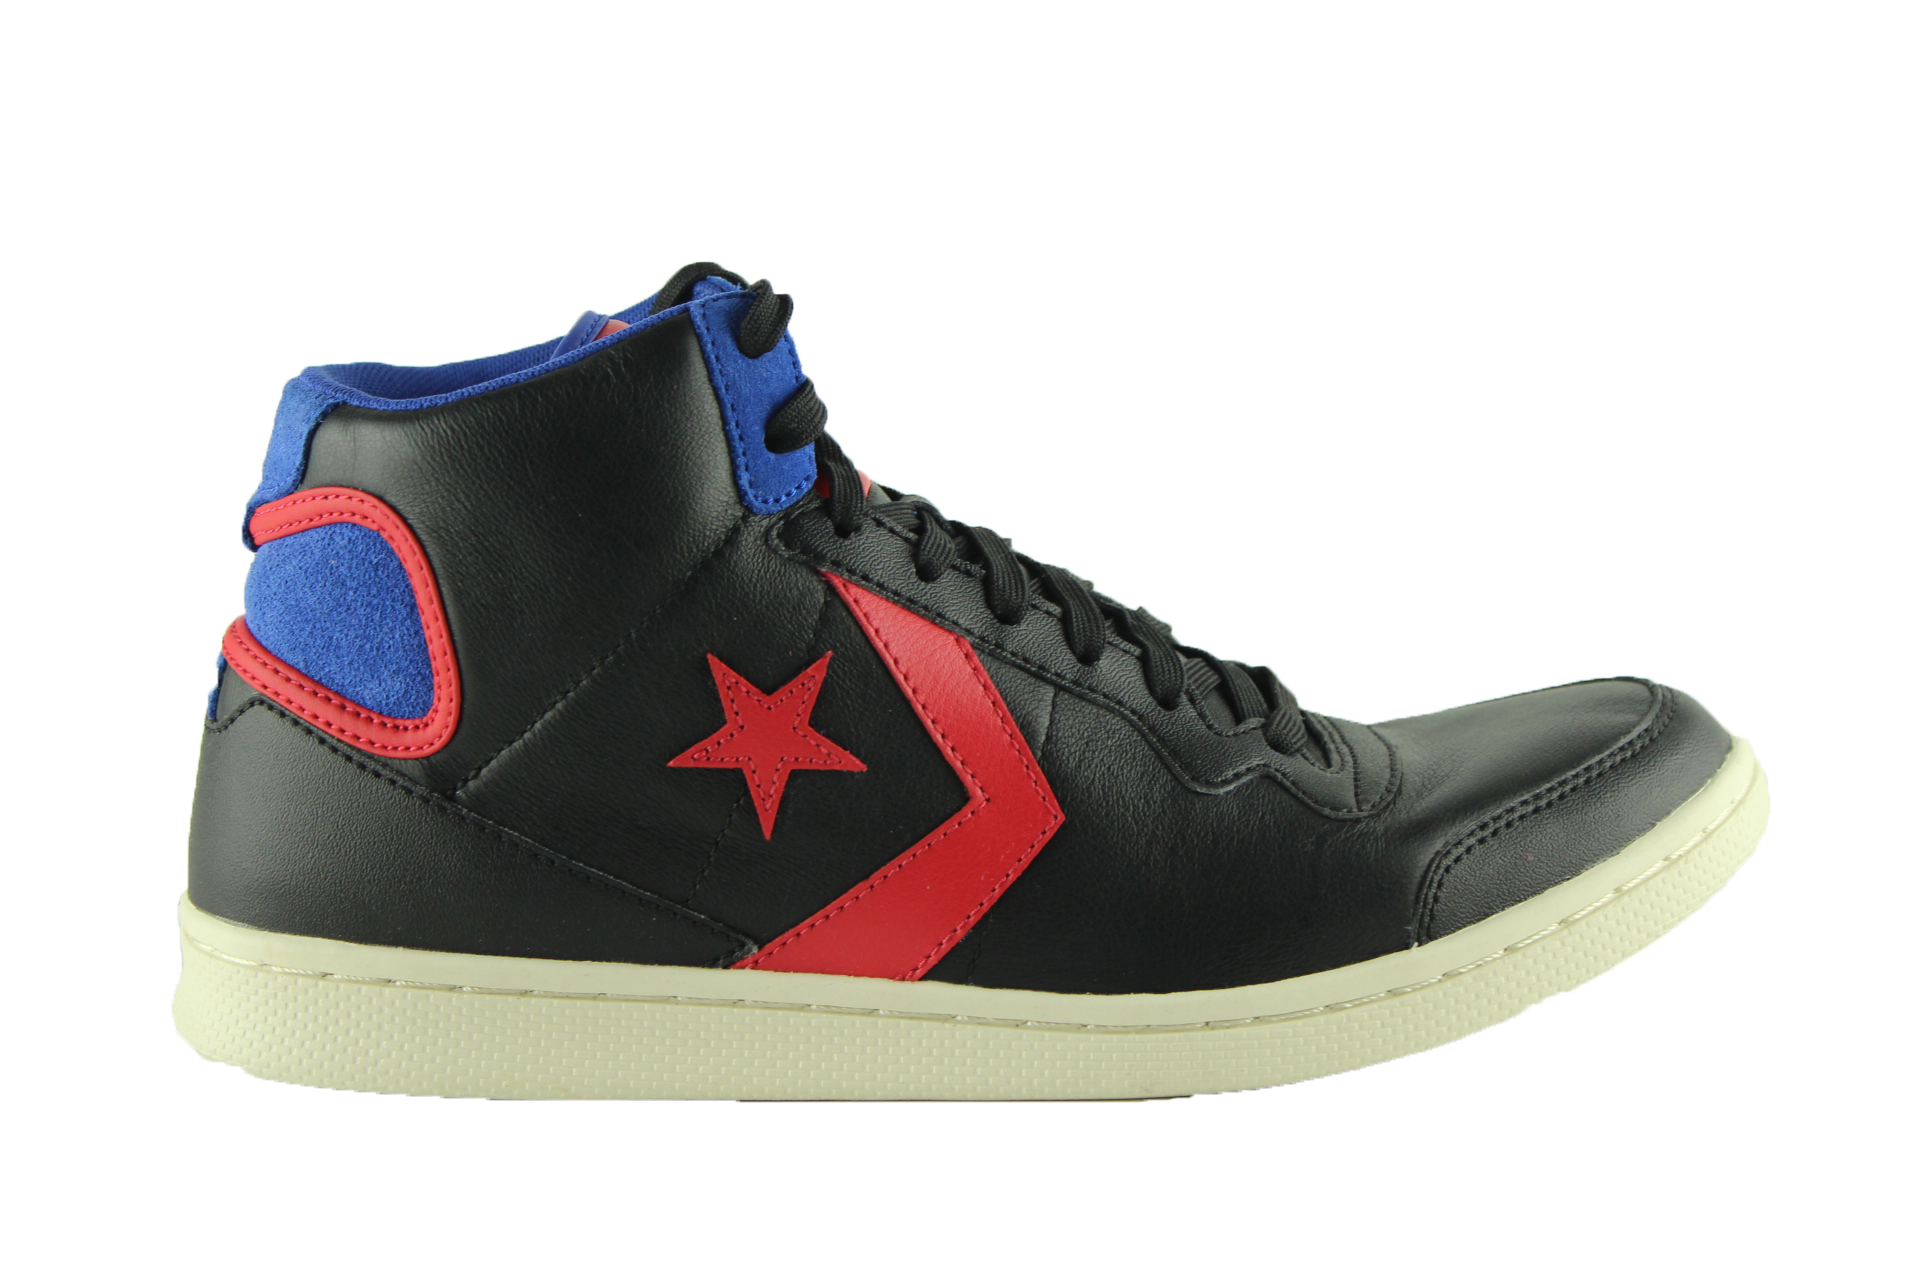 564 converse fast break lp mid shoes black new size 42 5. Black Bedroom Furniture Sets. Home Design Ideas